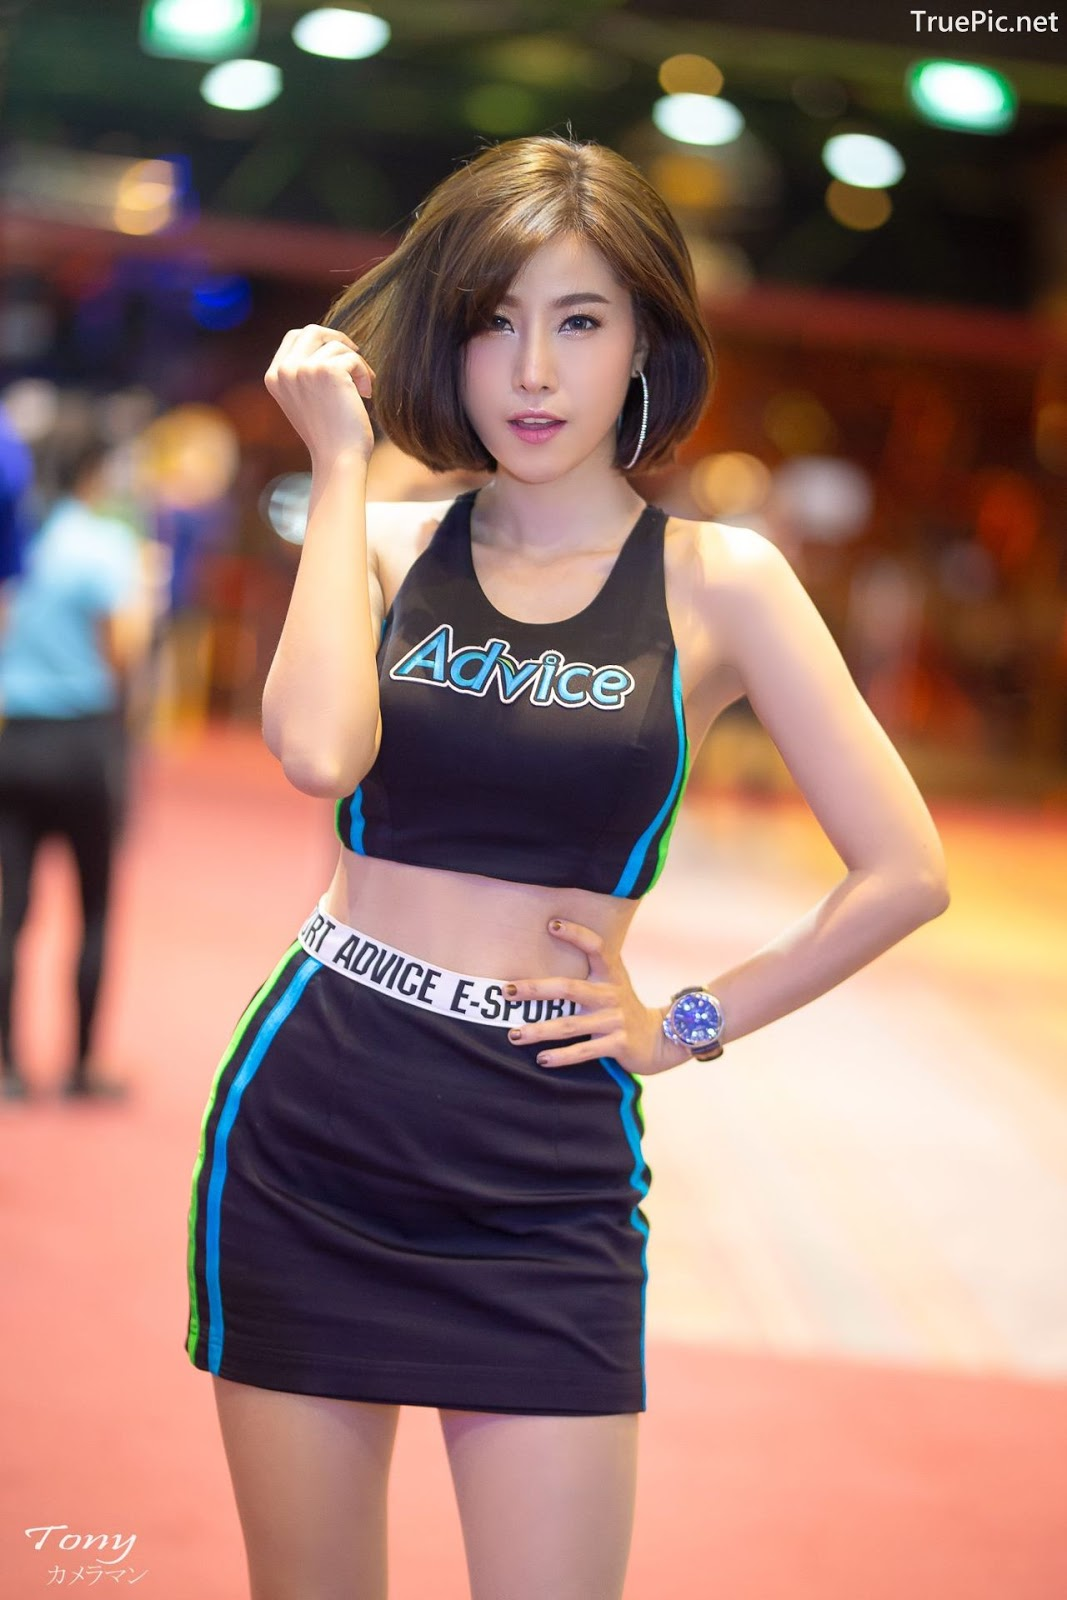 Image-Thailand-Hot-Model-Thai-PG-At-Commart-2018-TruePic.net- Picture-44